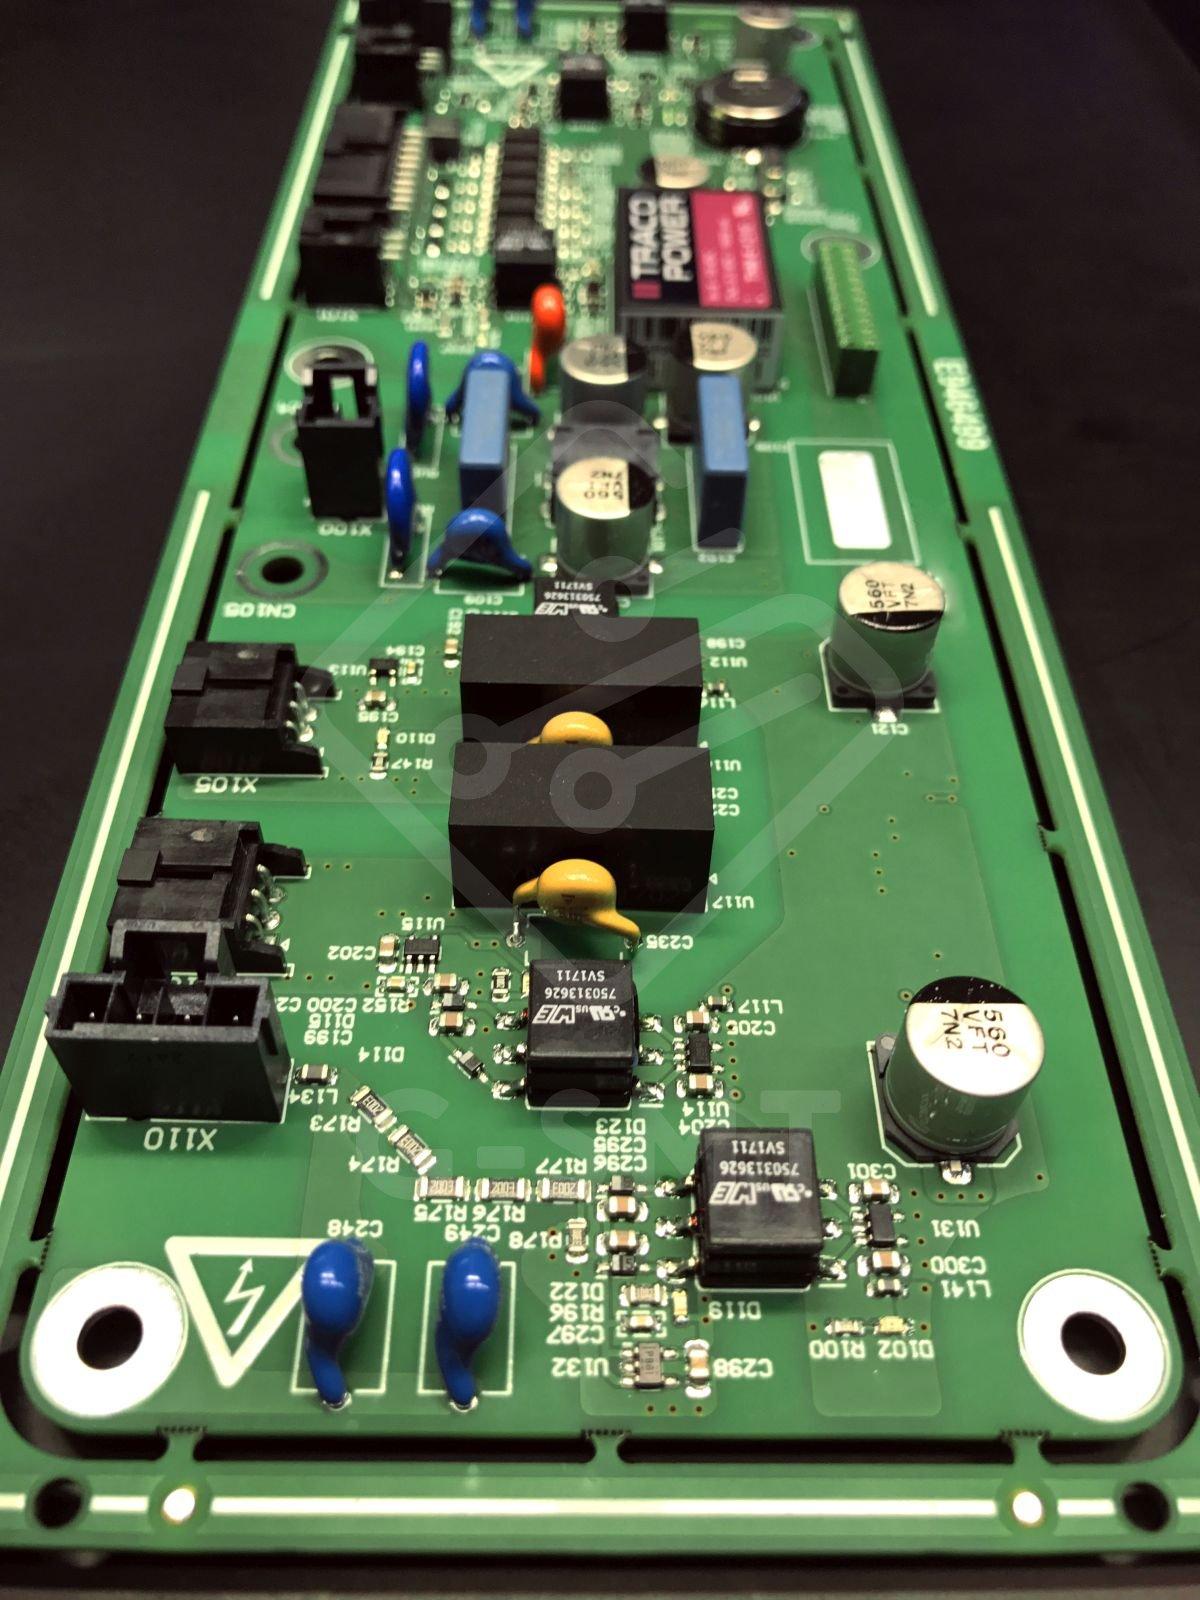 G Smt Surface Mount Technology Printed Circuit Board Assemblies Pcba Thru Hole Bga Etc Prototype Manufacturing